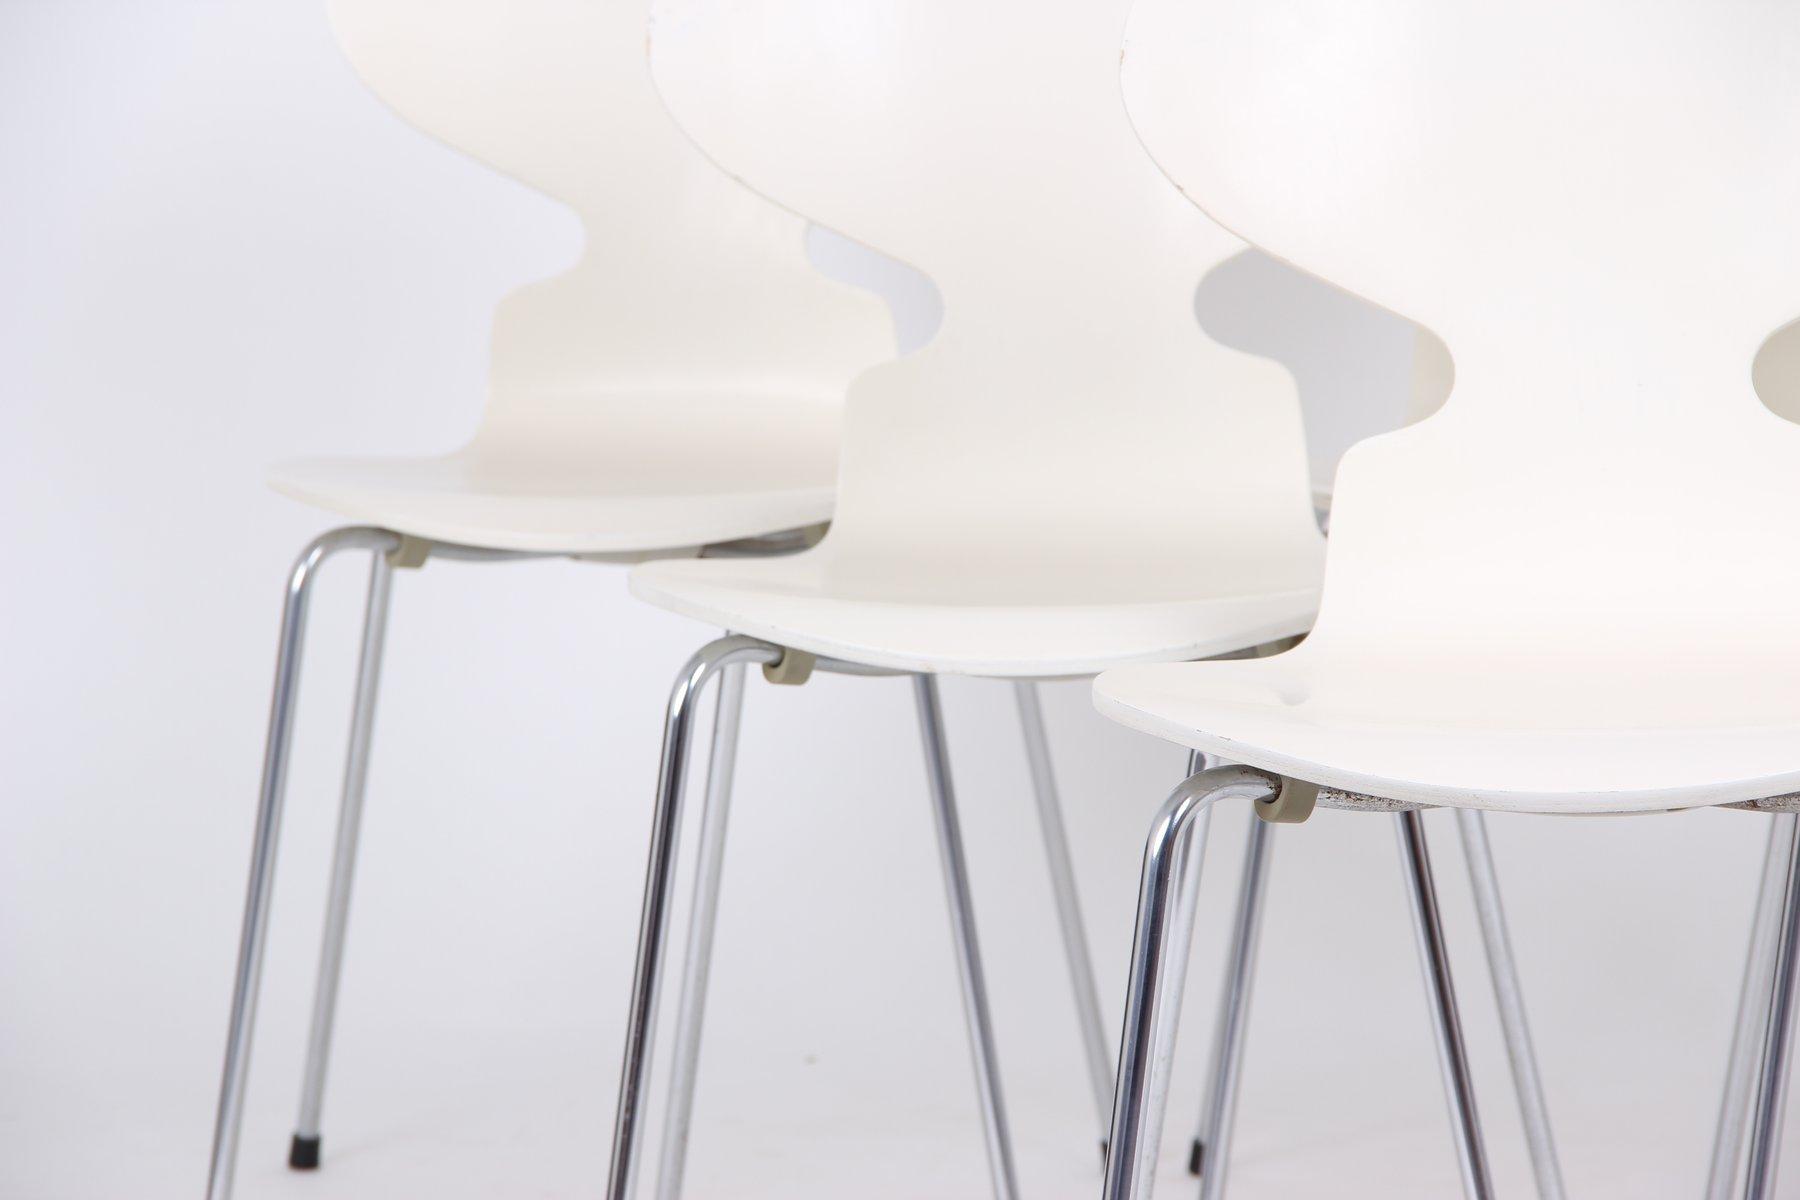 wei e modell 3101 esszimmerst hle von arne jacobsen f r. Black Bedroom Furniture Sets. Home Design Ideas